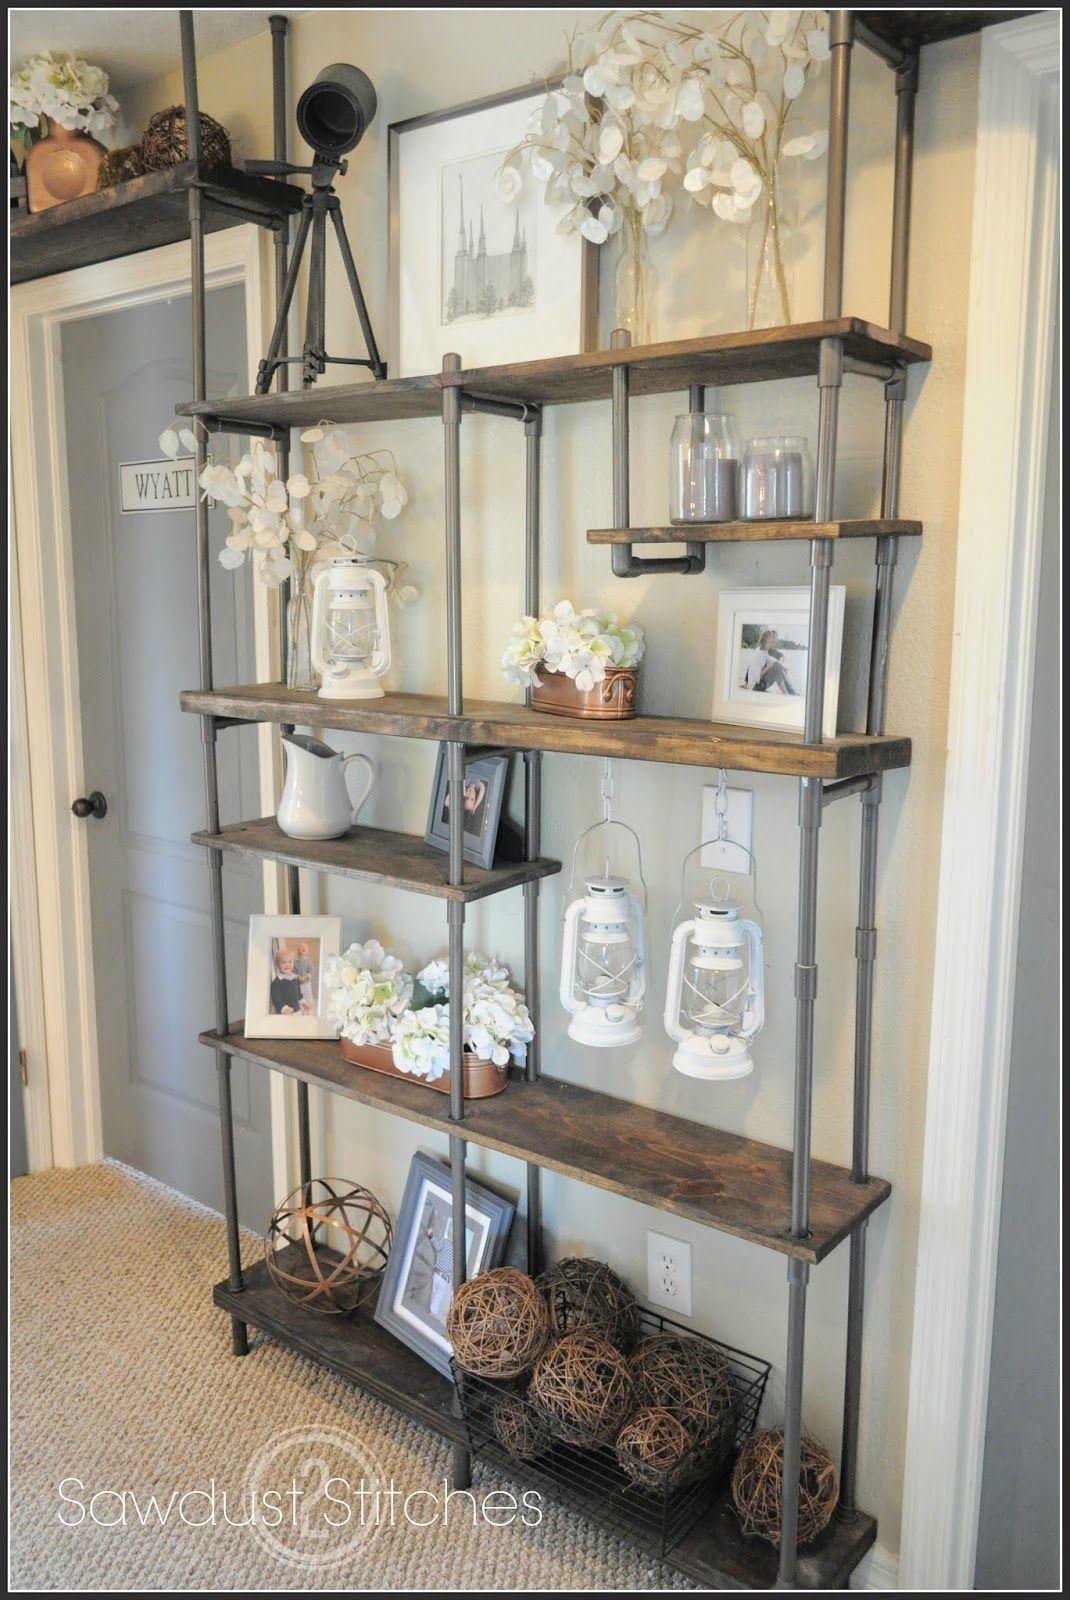 Build a Budget Friendly Industrial Shelf Using PVC Pipe